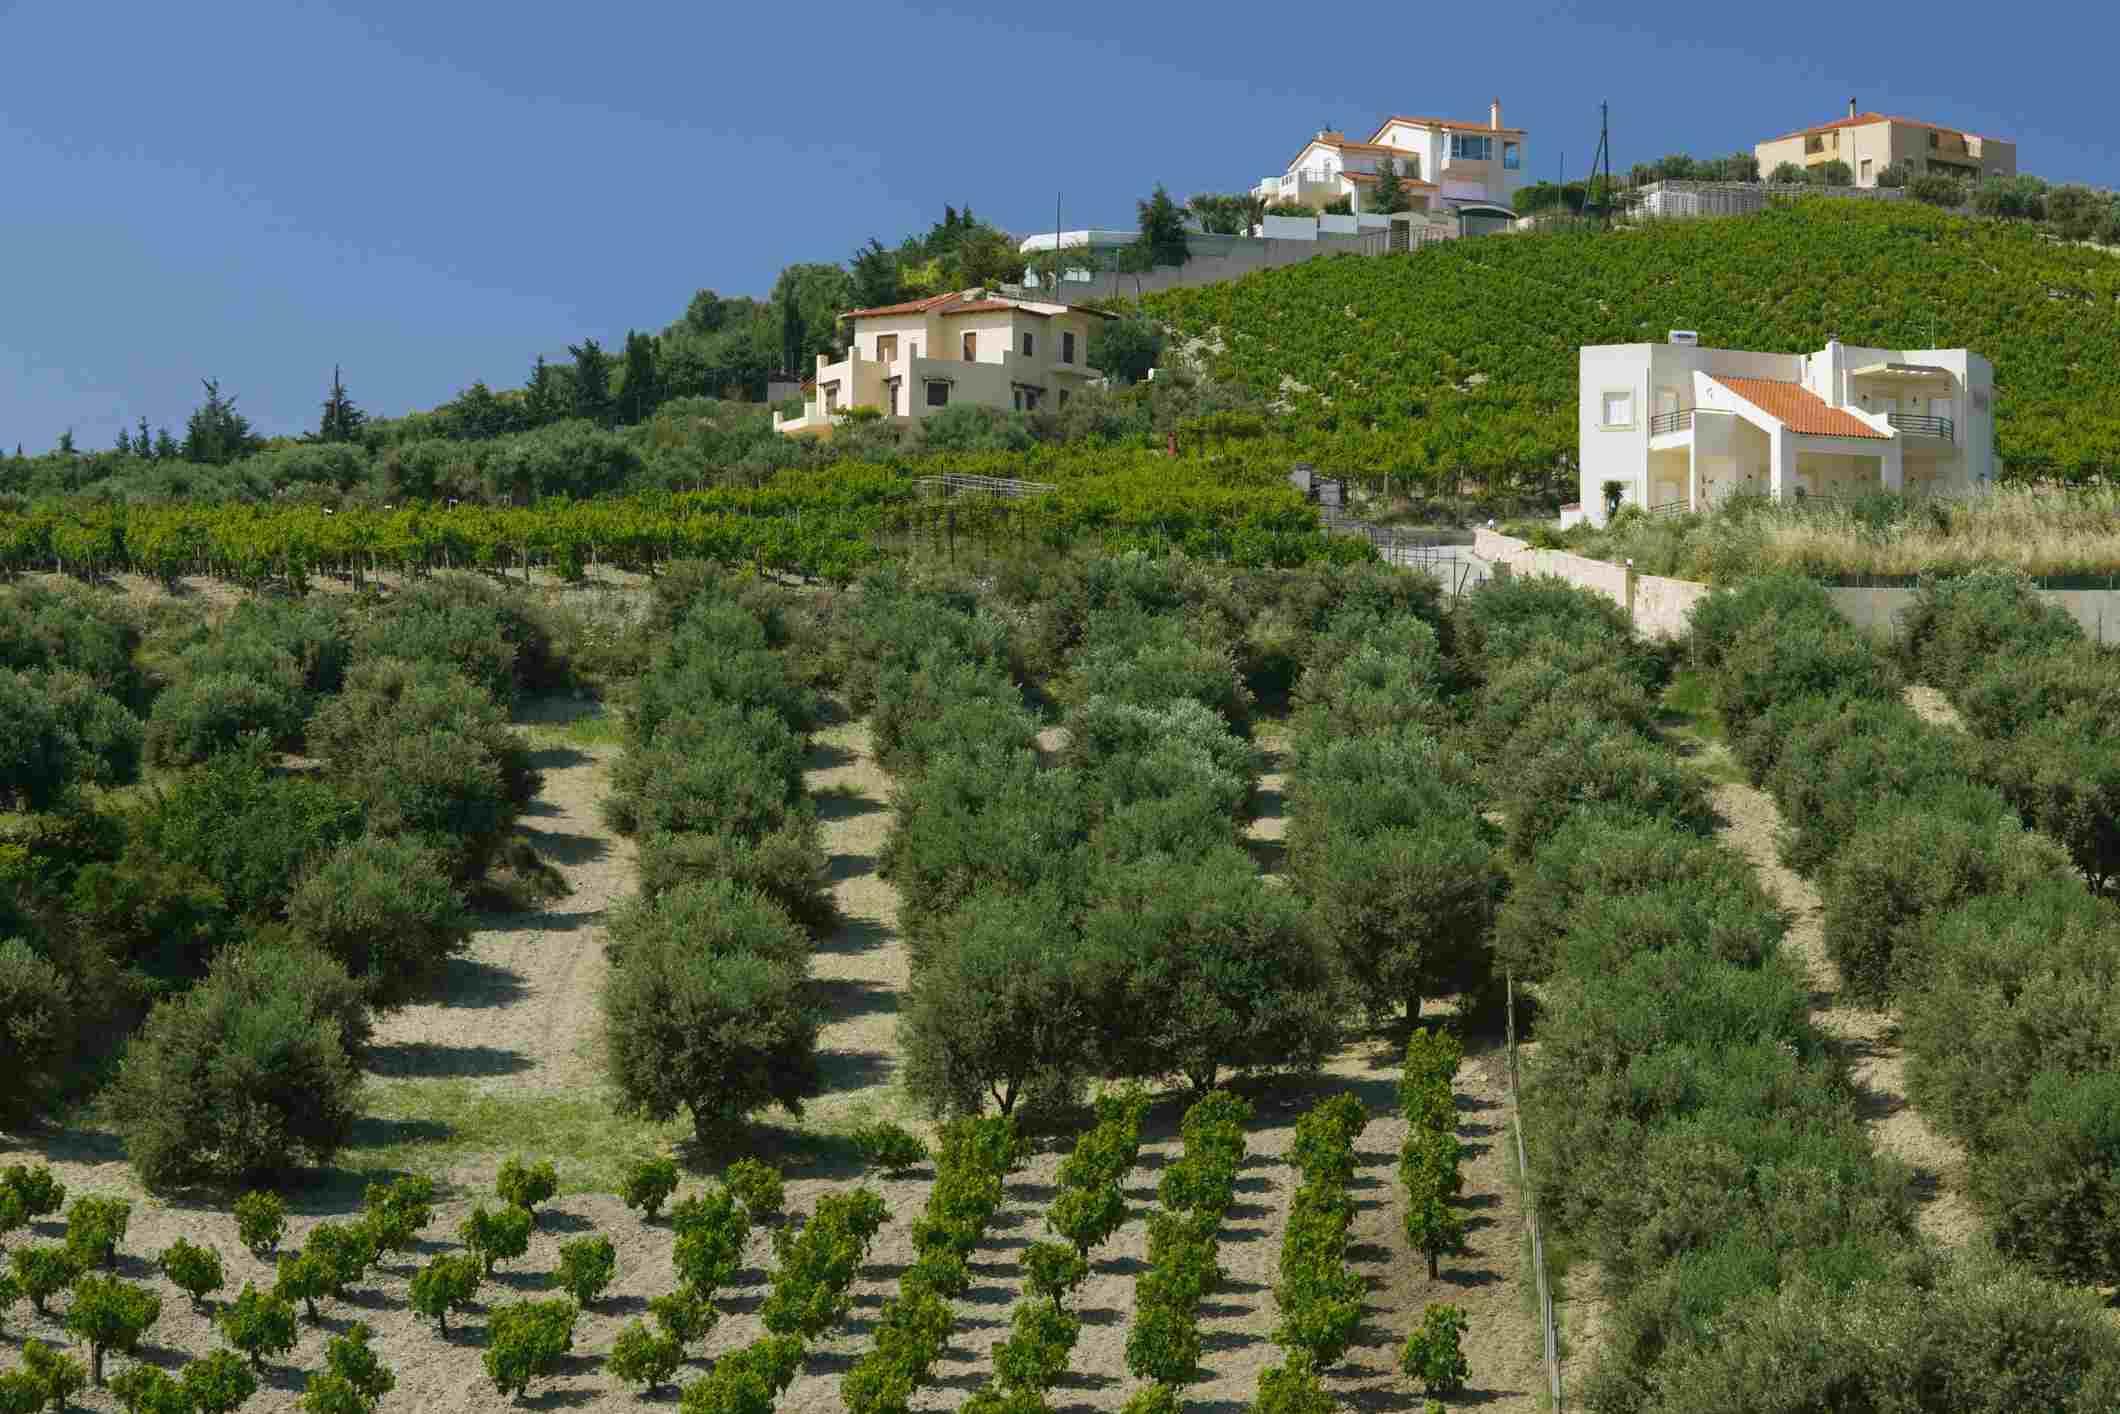 Vineyards, Iraklio Province, Central Iraklio, Pano Archanes, Crete, Greece